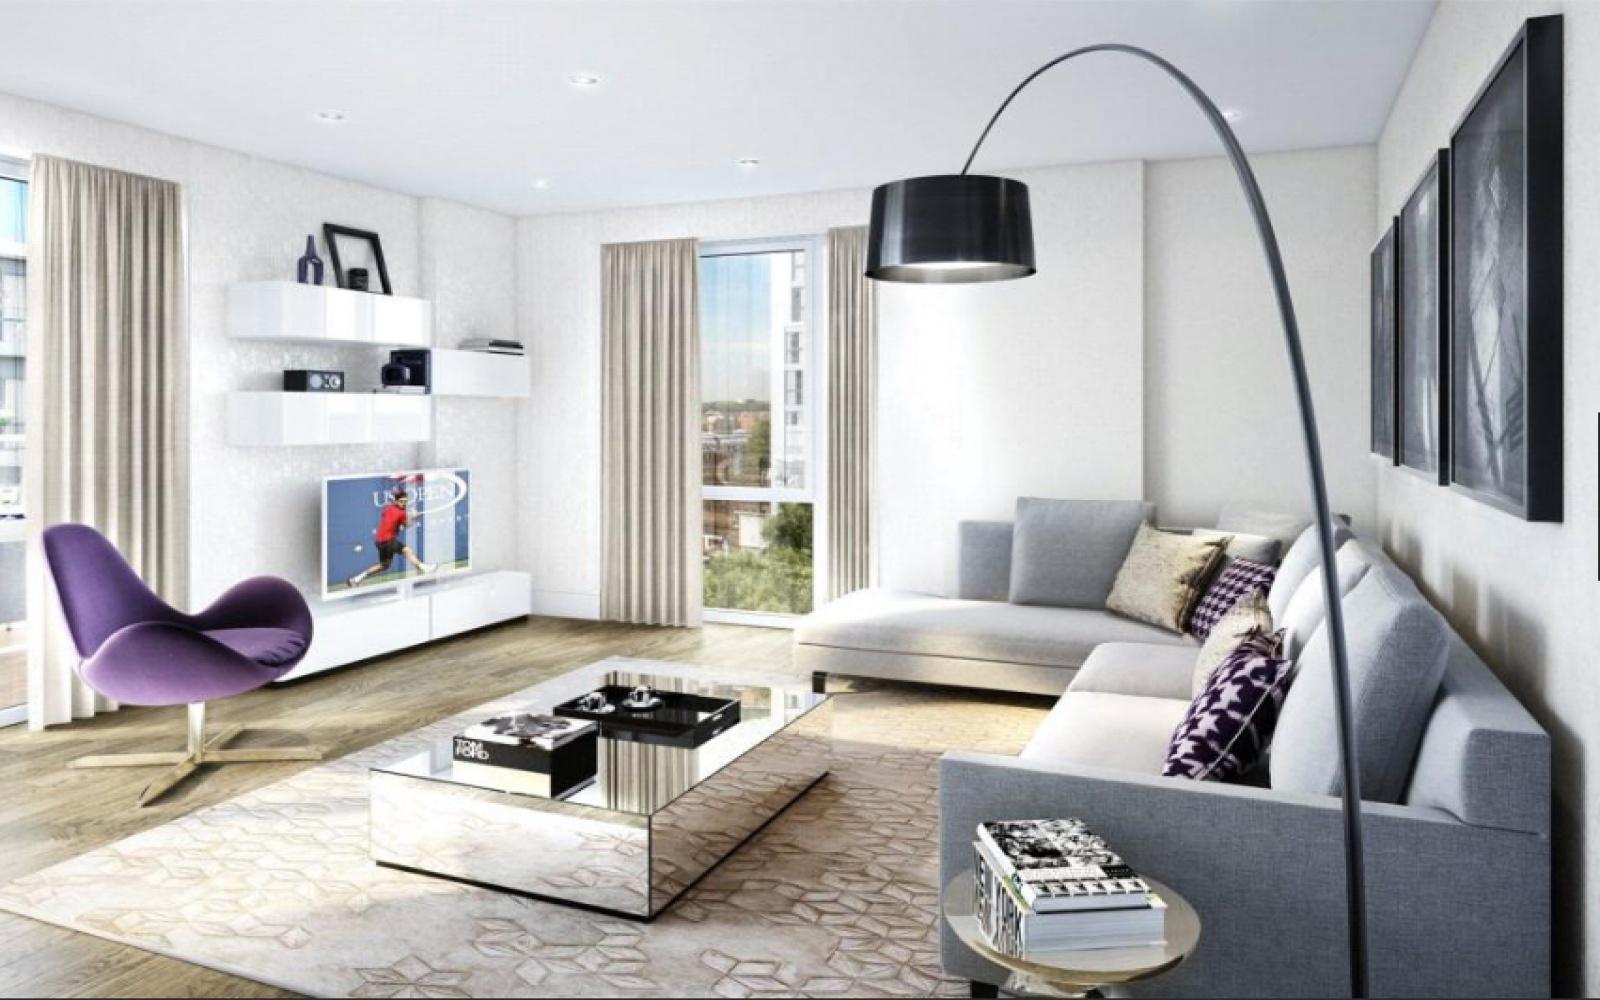 1 Bedrooms, Flat, For Sale, Wandsworth Road, 1 Bathrooms, Listing ID 1044, United Kingdom, Nine Elms,